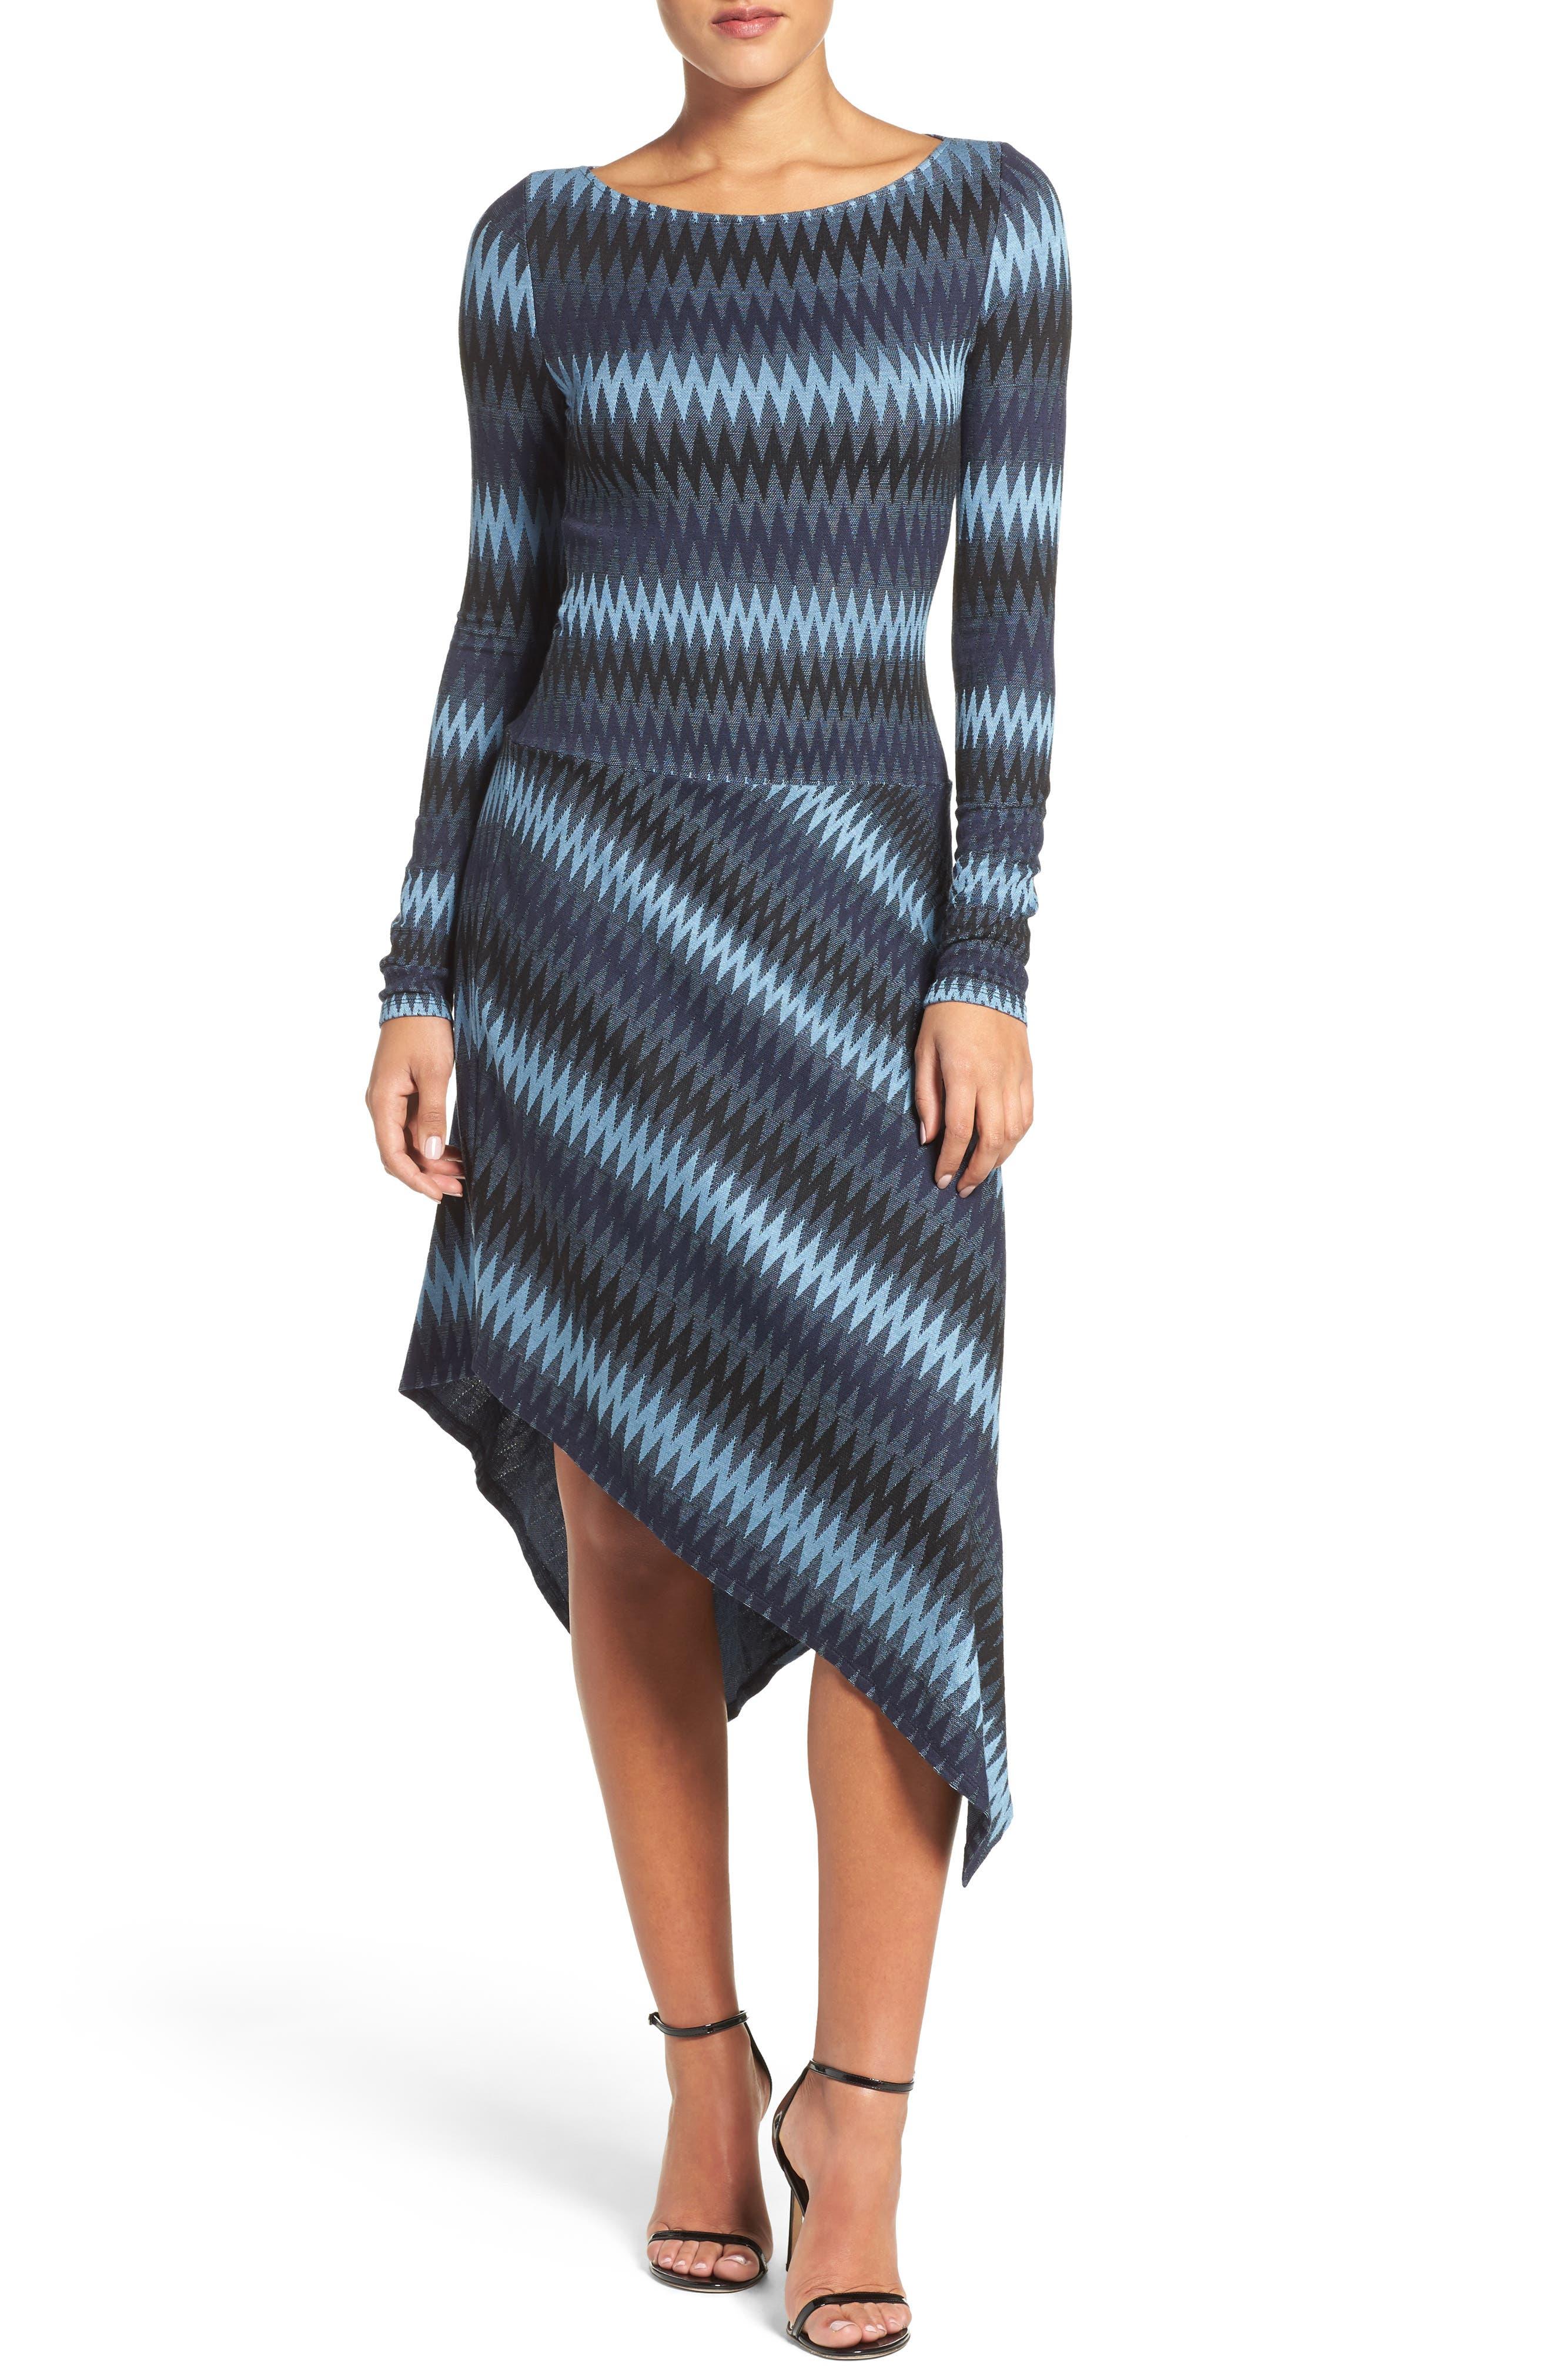 Alternate Image 1 Selected - BCBGMAXAZRIA Asymmetrical Knit Dress